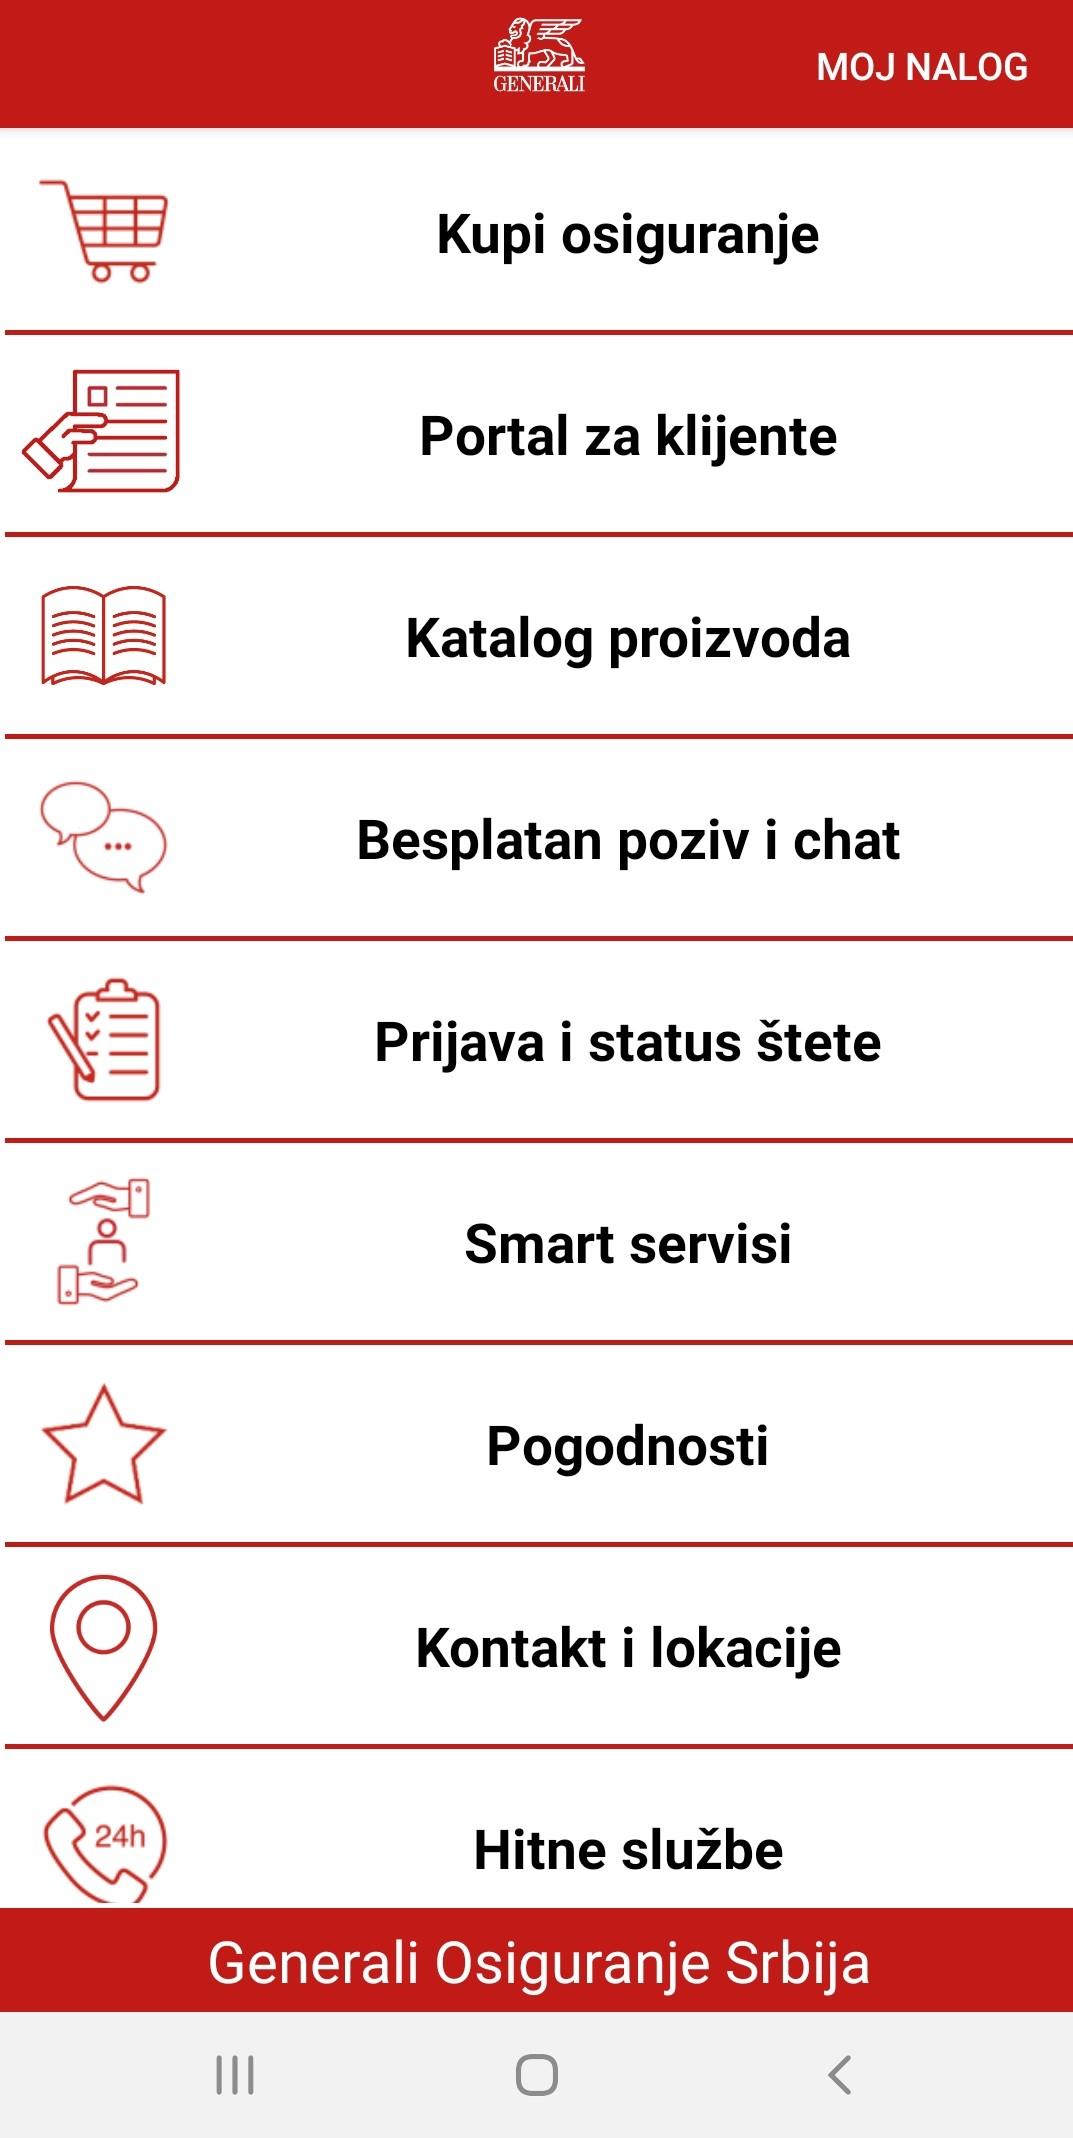 Generali aplikacija